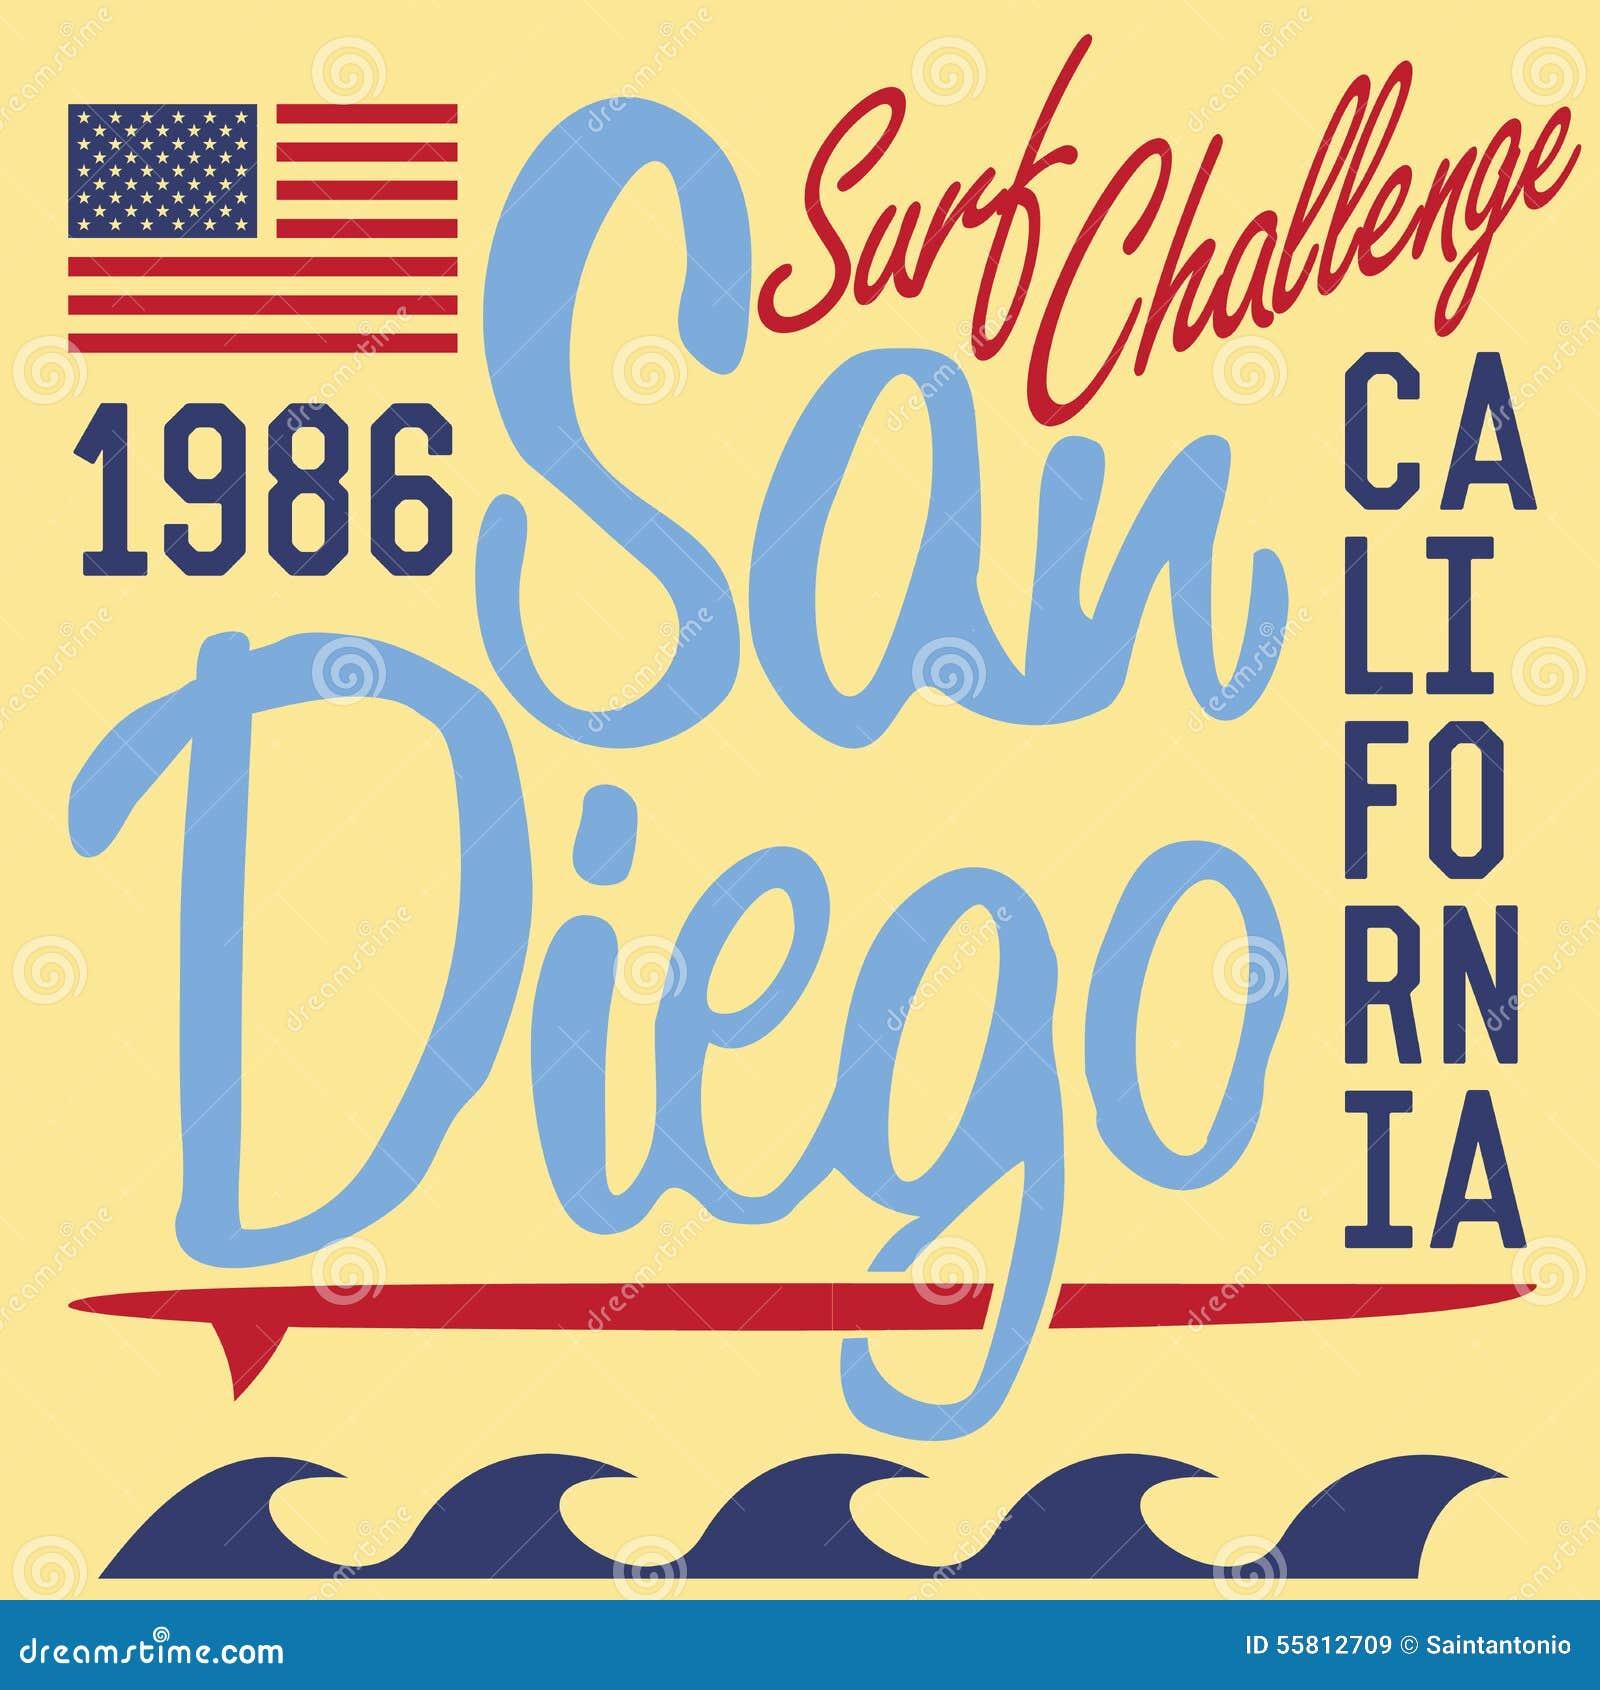 Shirt design san diego - T Shirt Printing Design Typography Graphics Summer Vector Illustration Badge Applique Label California San